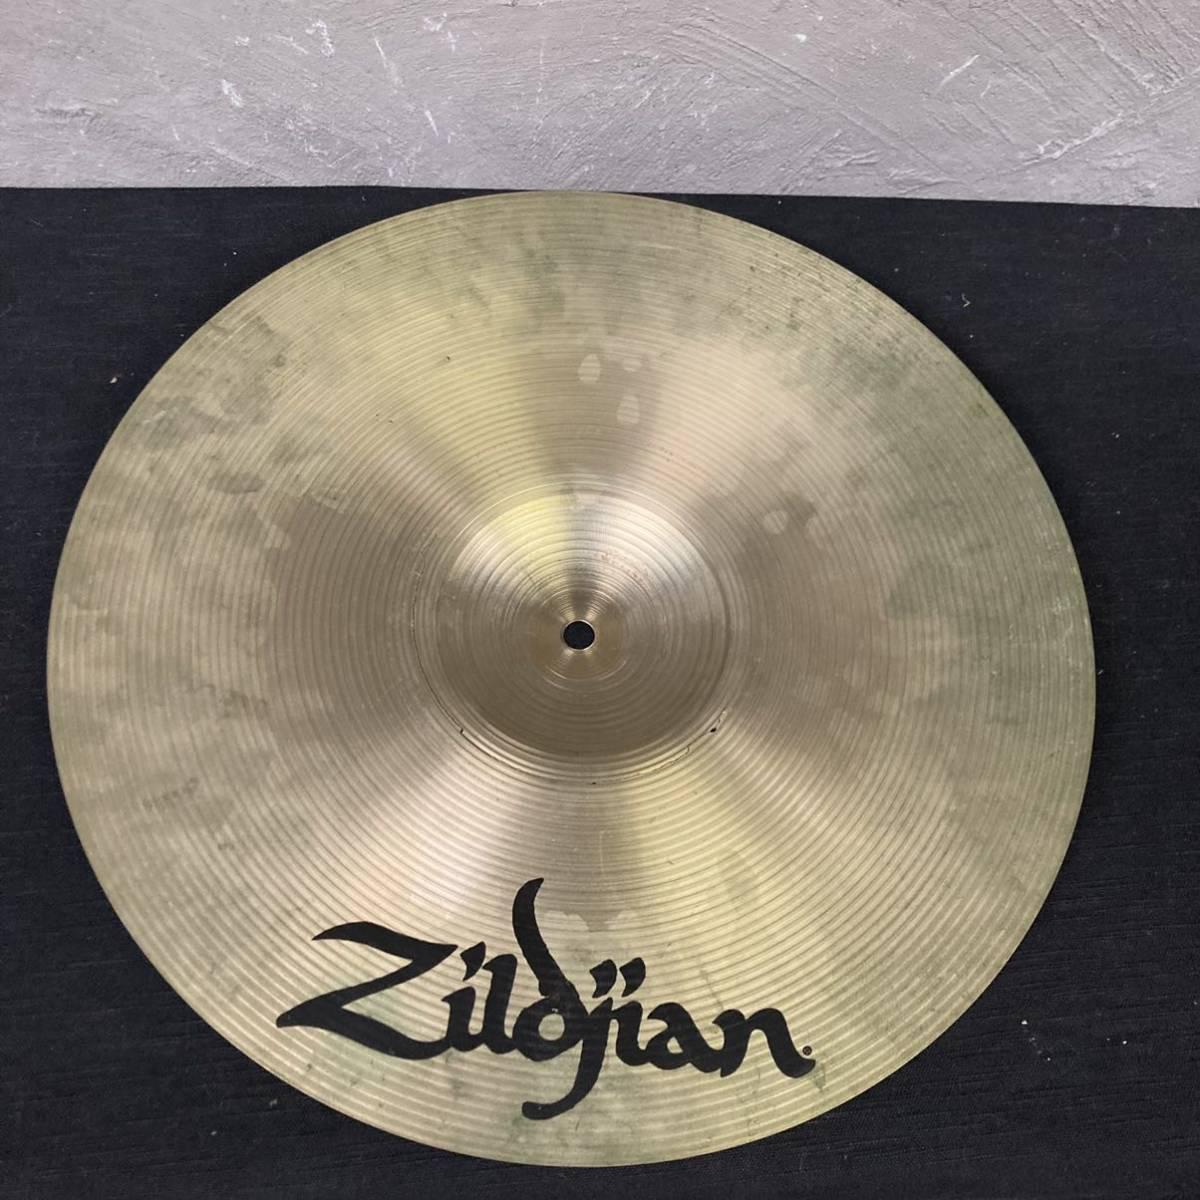 "◯(N3 sa) Zildjian Rock Crash 16"" ジャンク 割れ ジルジャン シンバル ドラム パイステ ケース付き (Ω0360)_画像6"